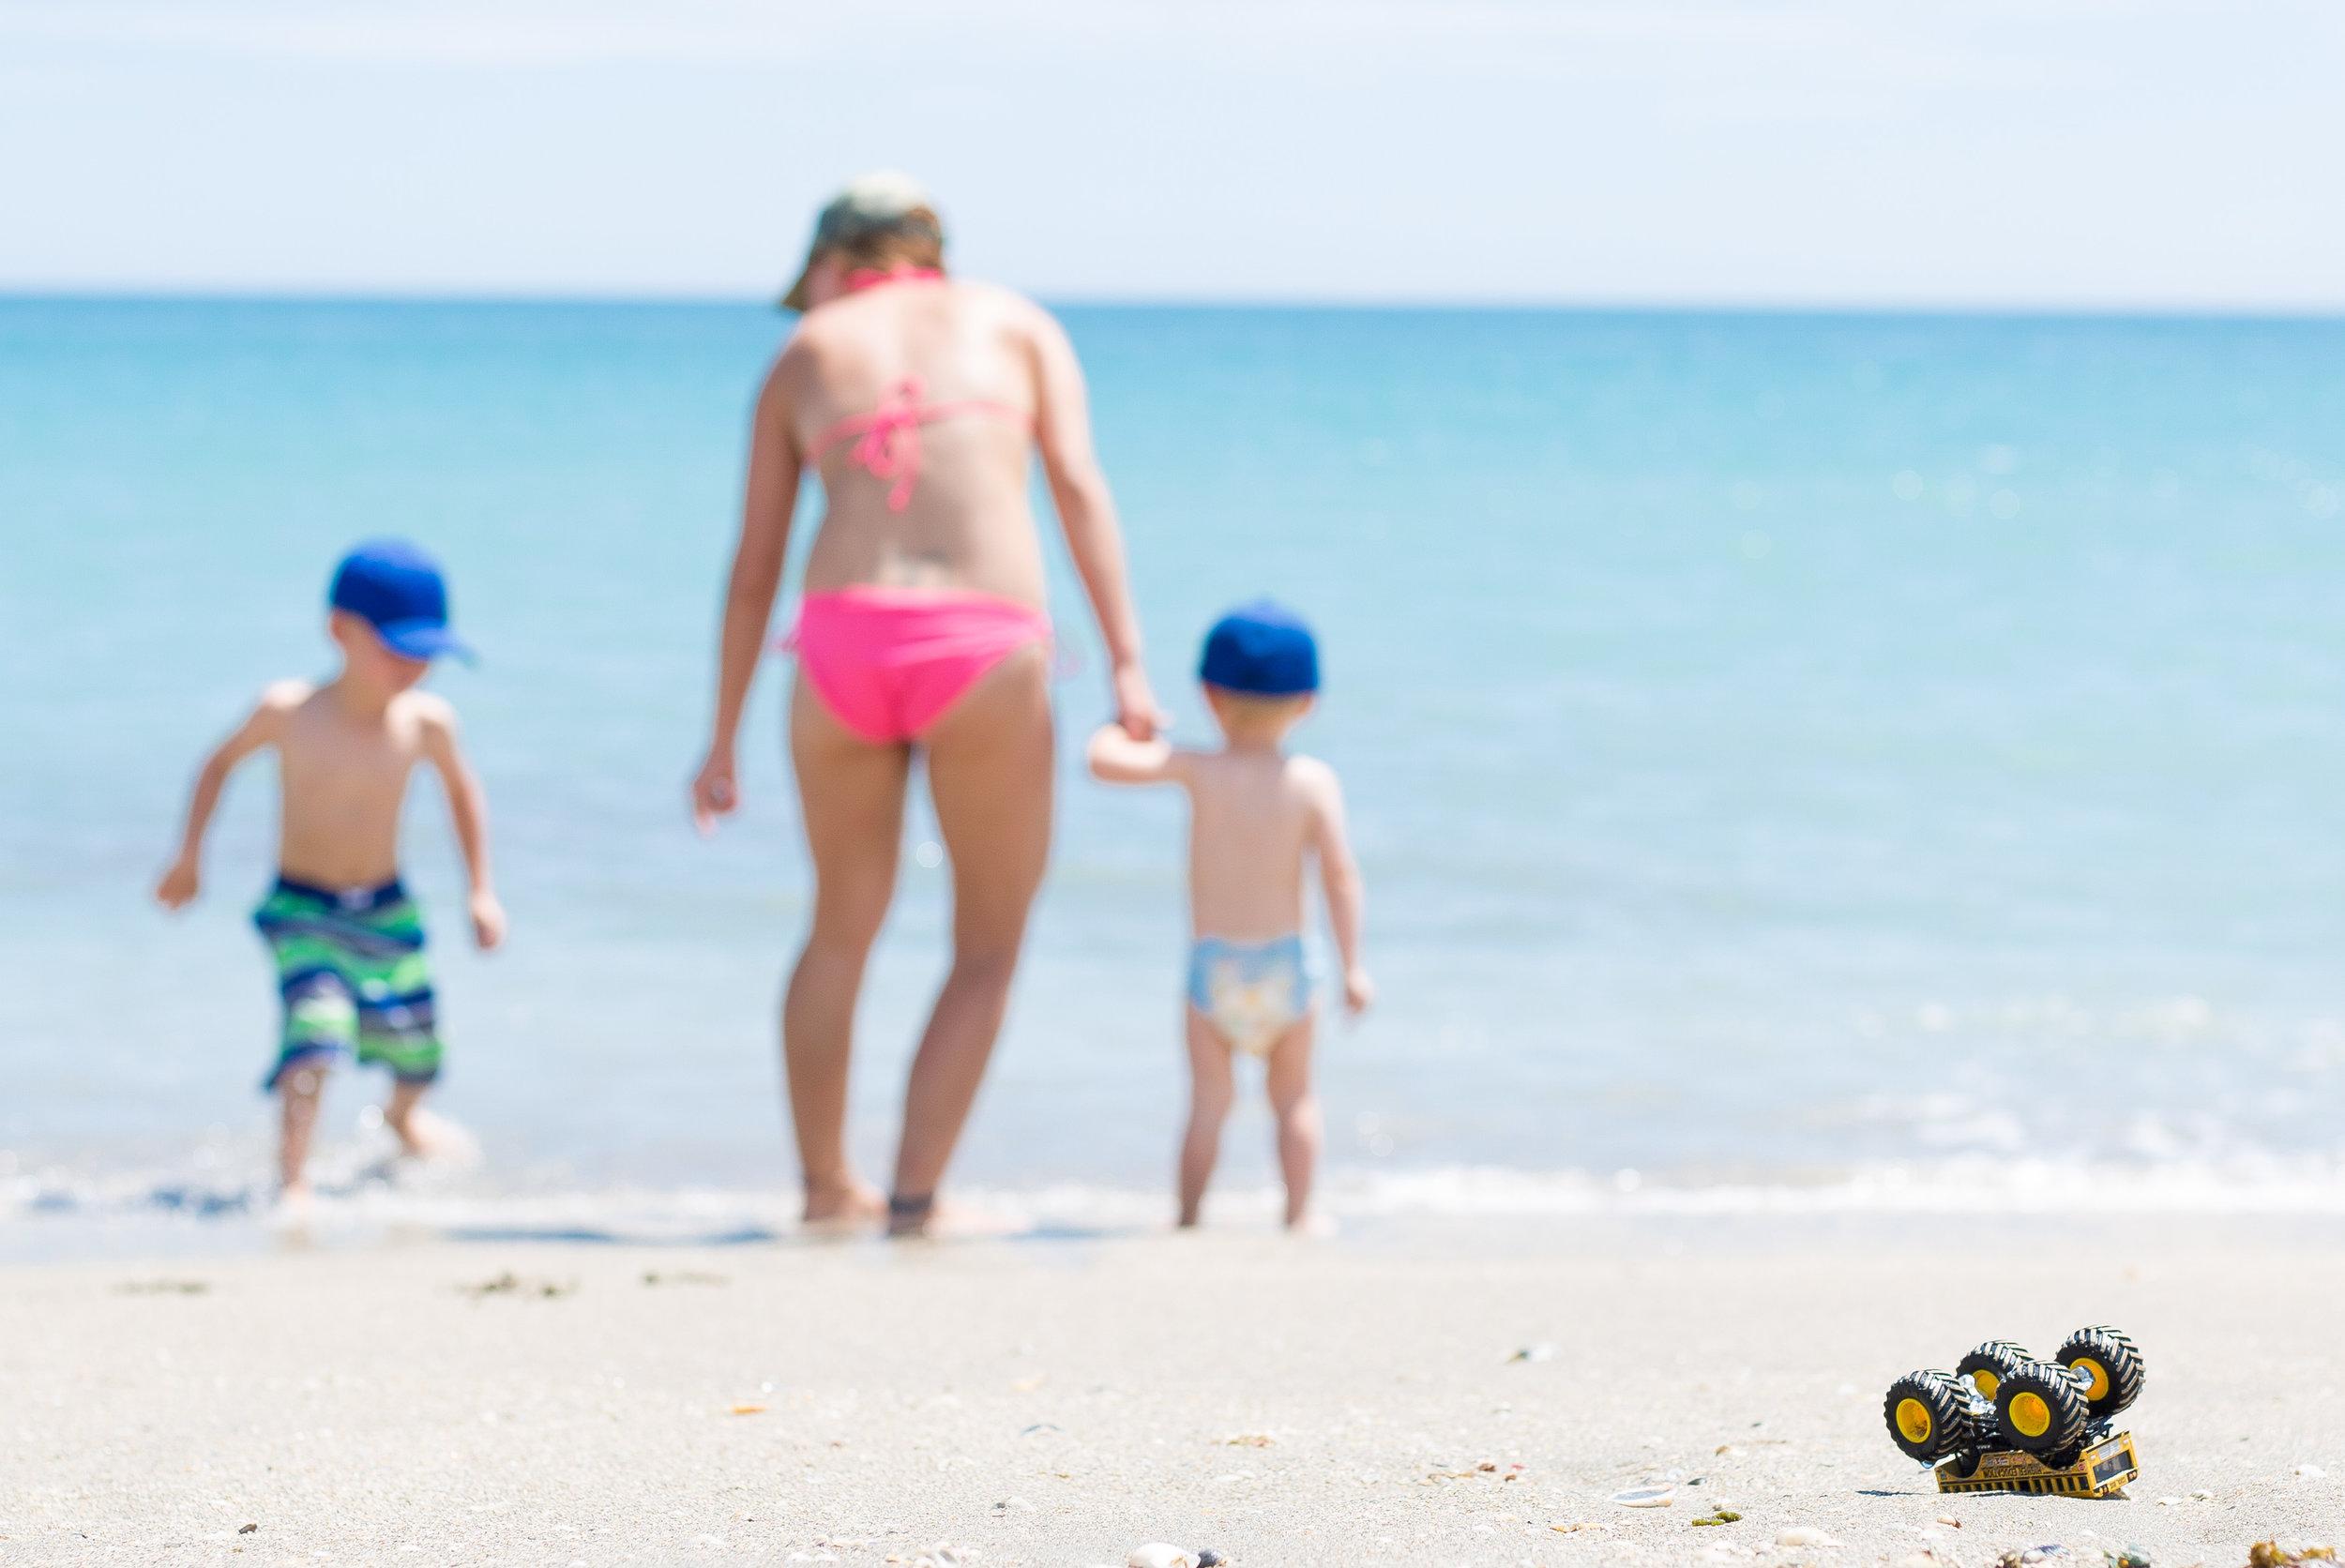 Florida Beach Personal Project-4.jpg